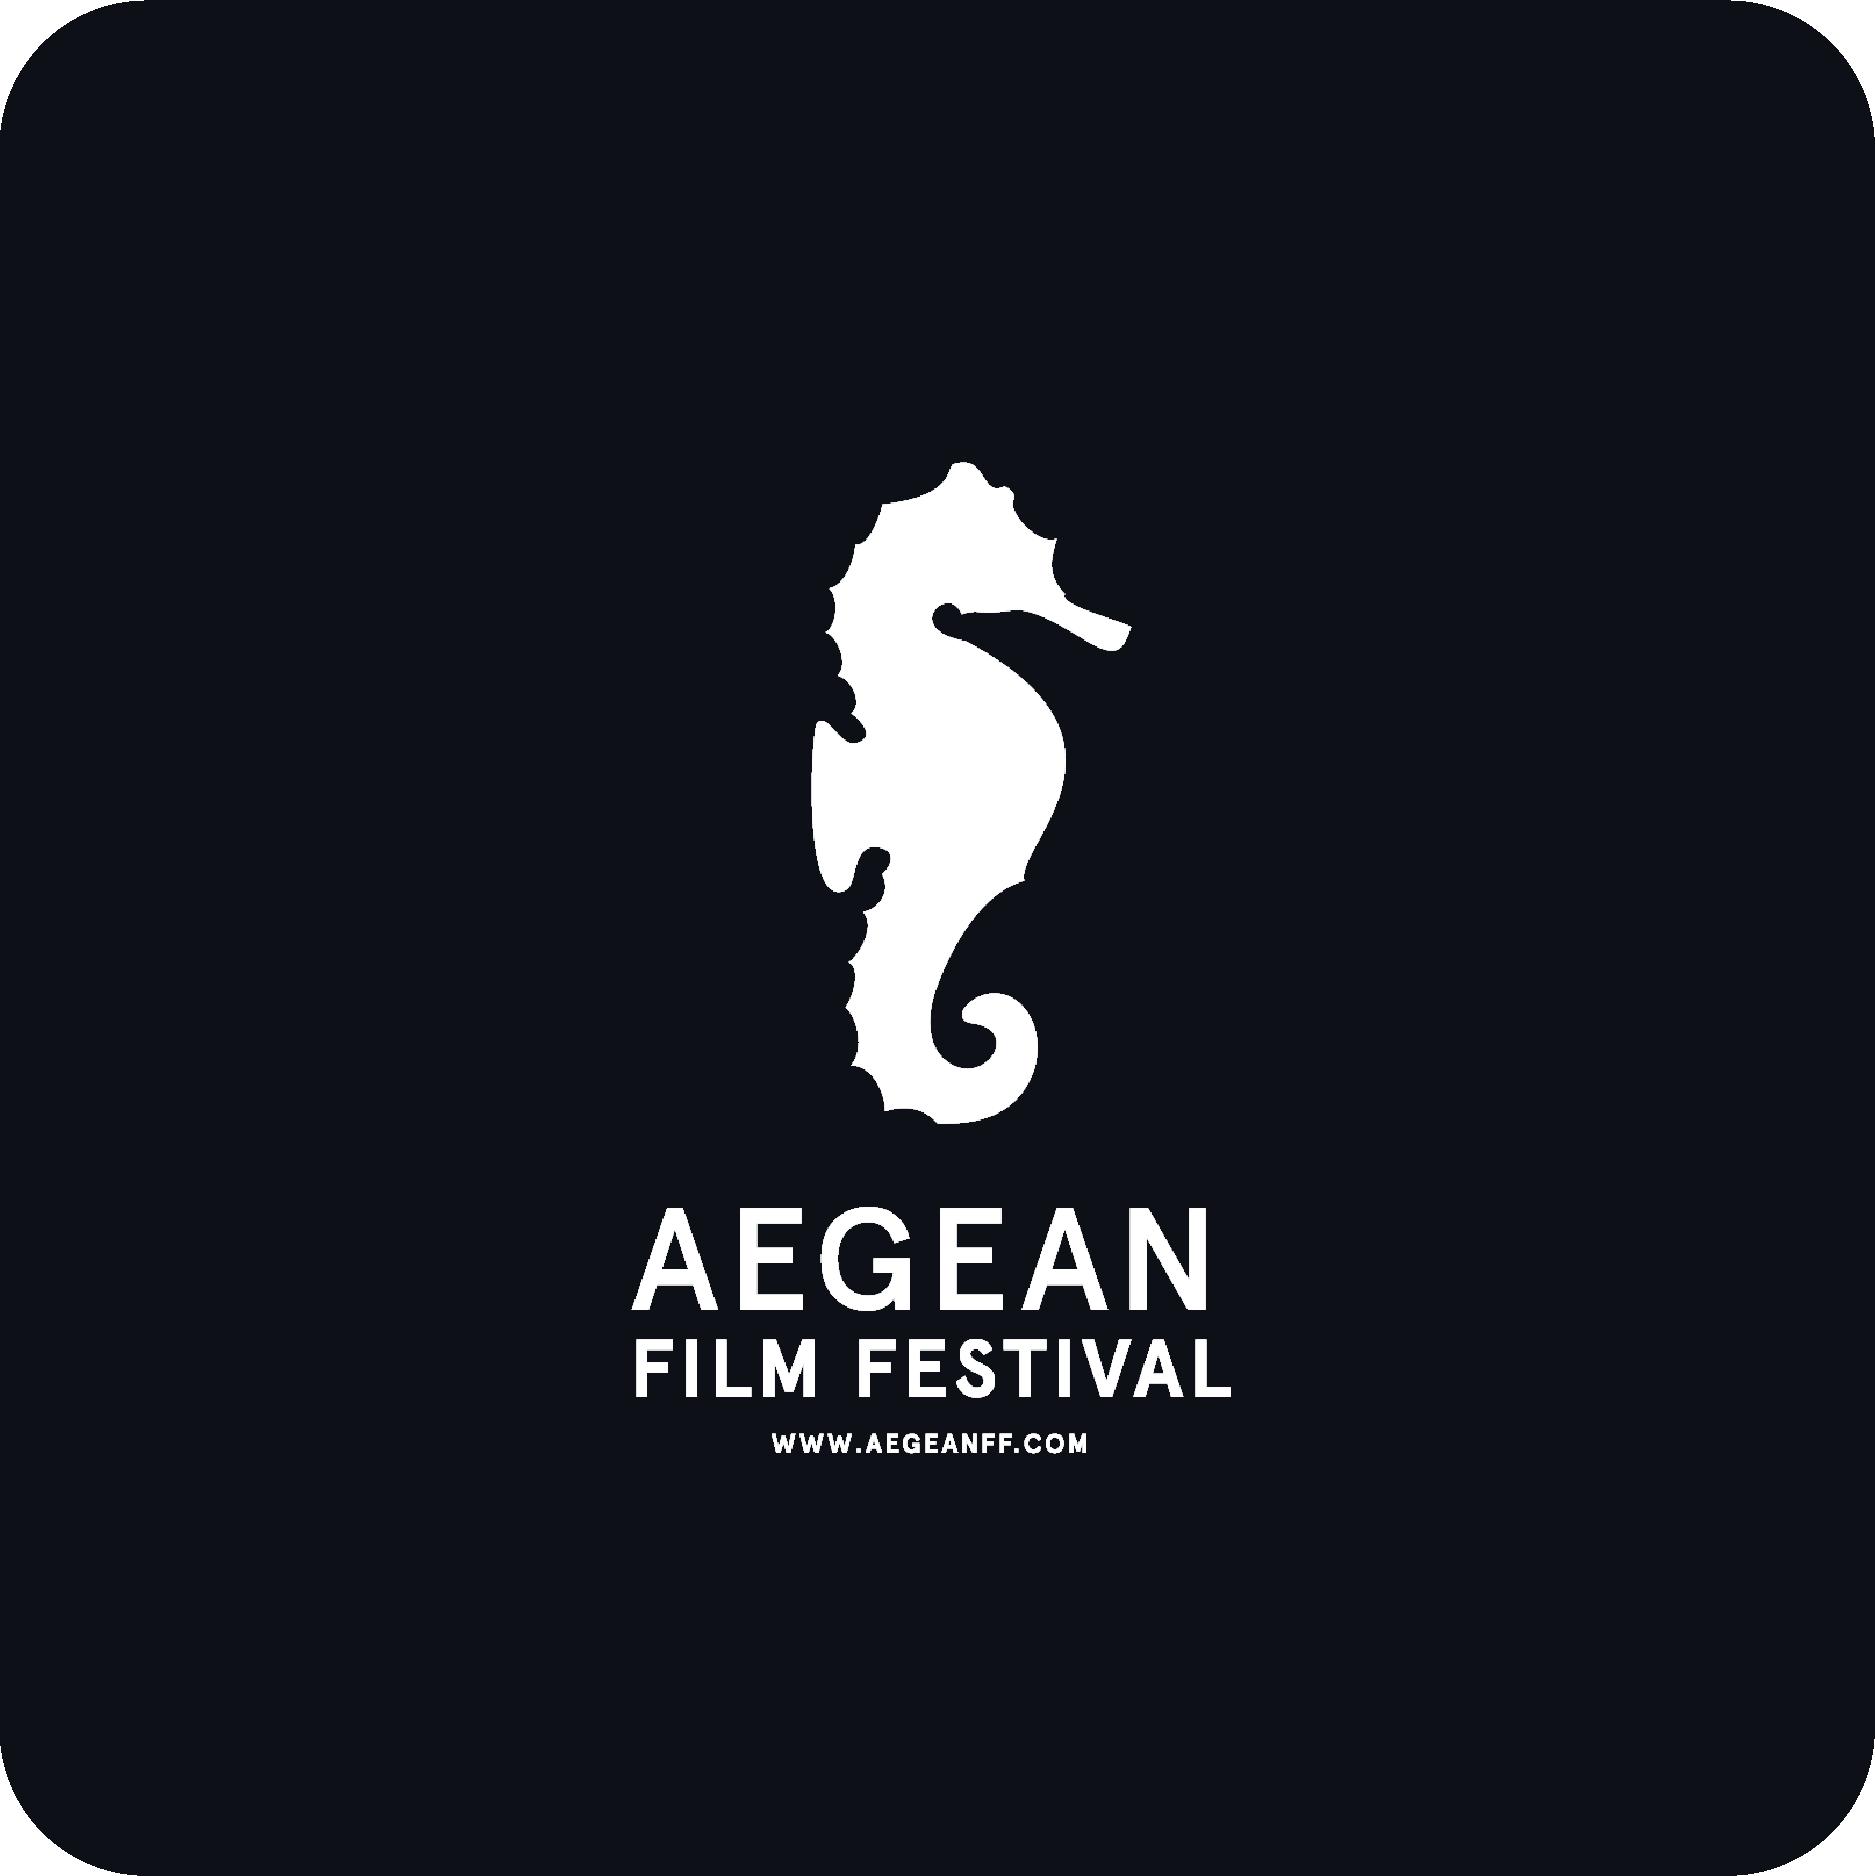 Aegean Film Festival Logo